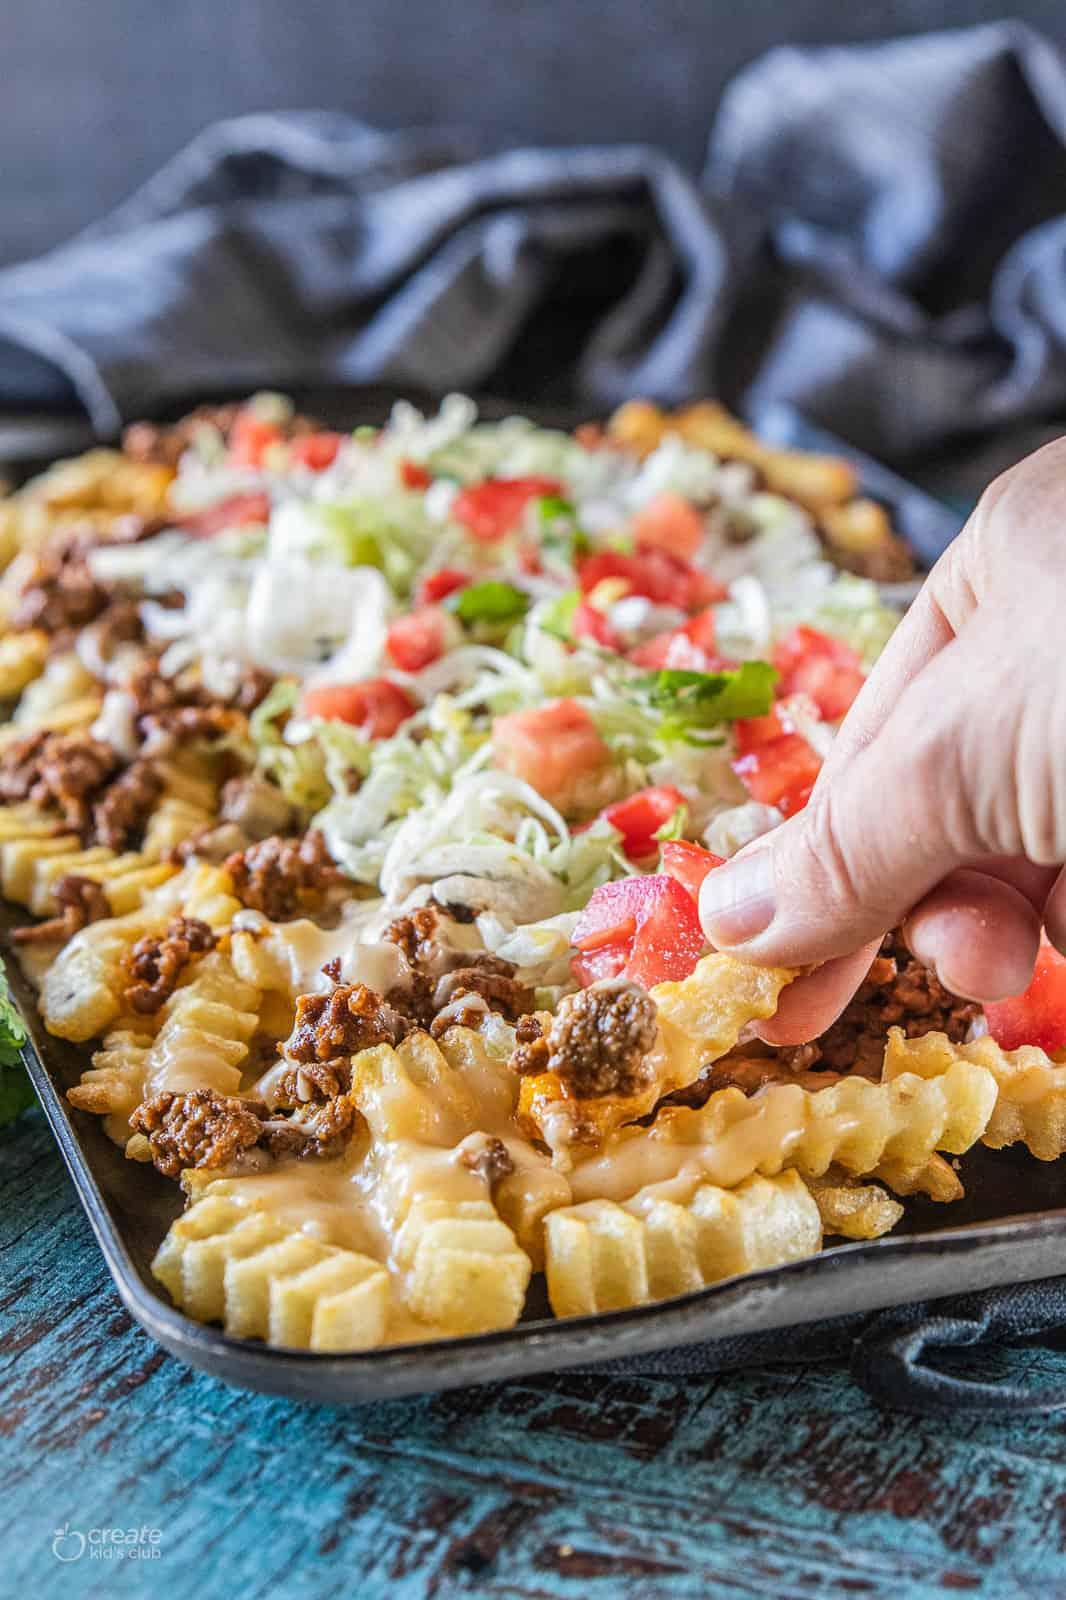 nacho fries on a baking dish